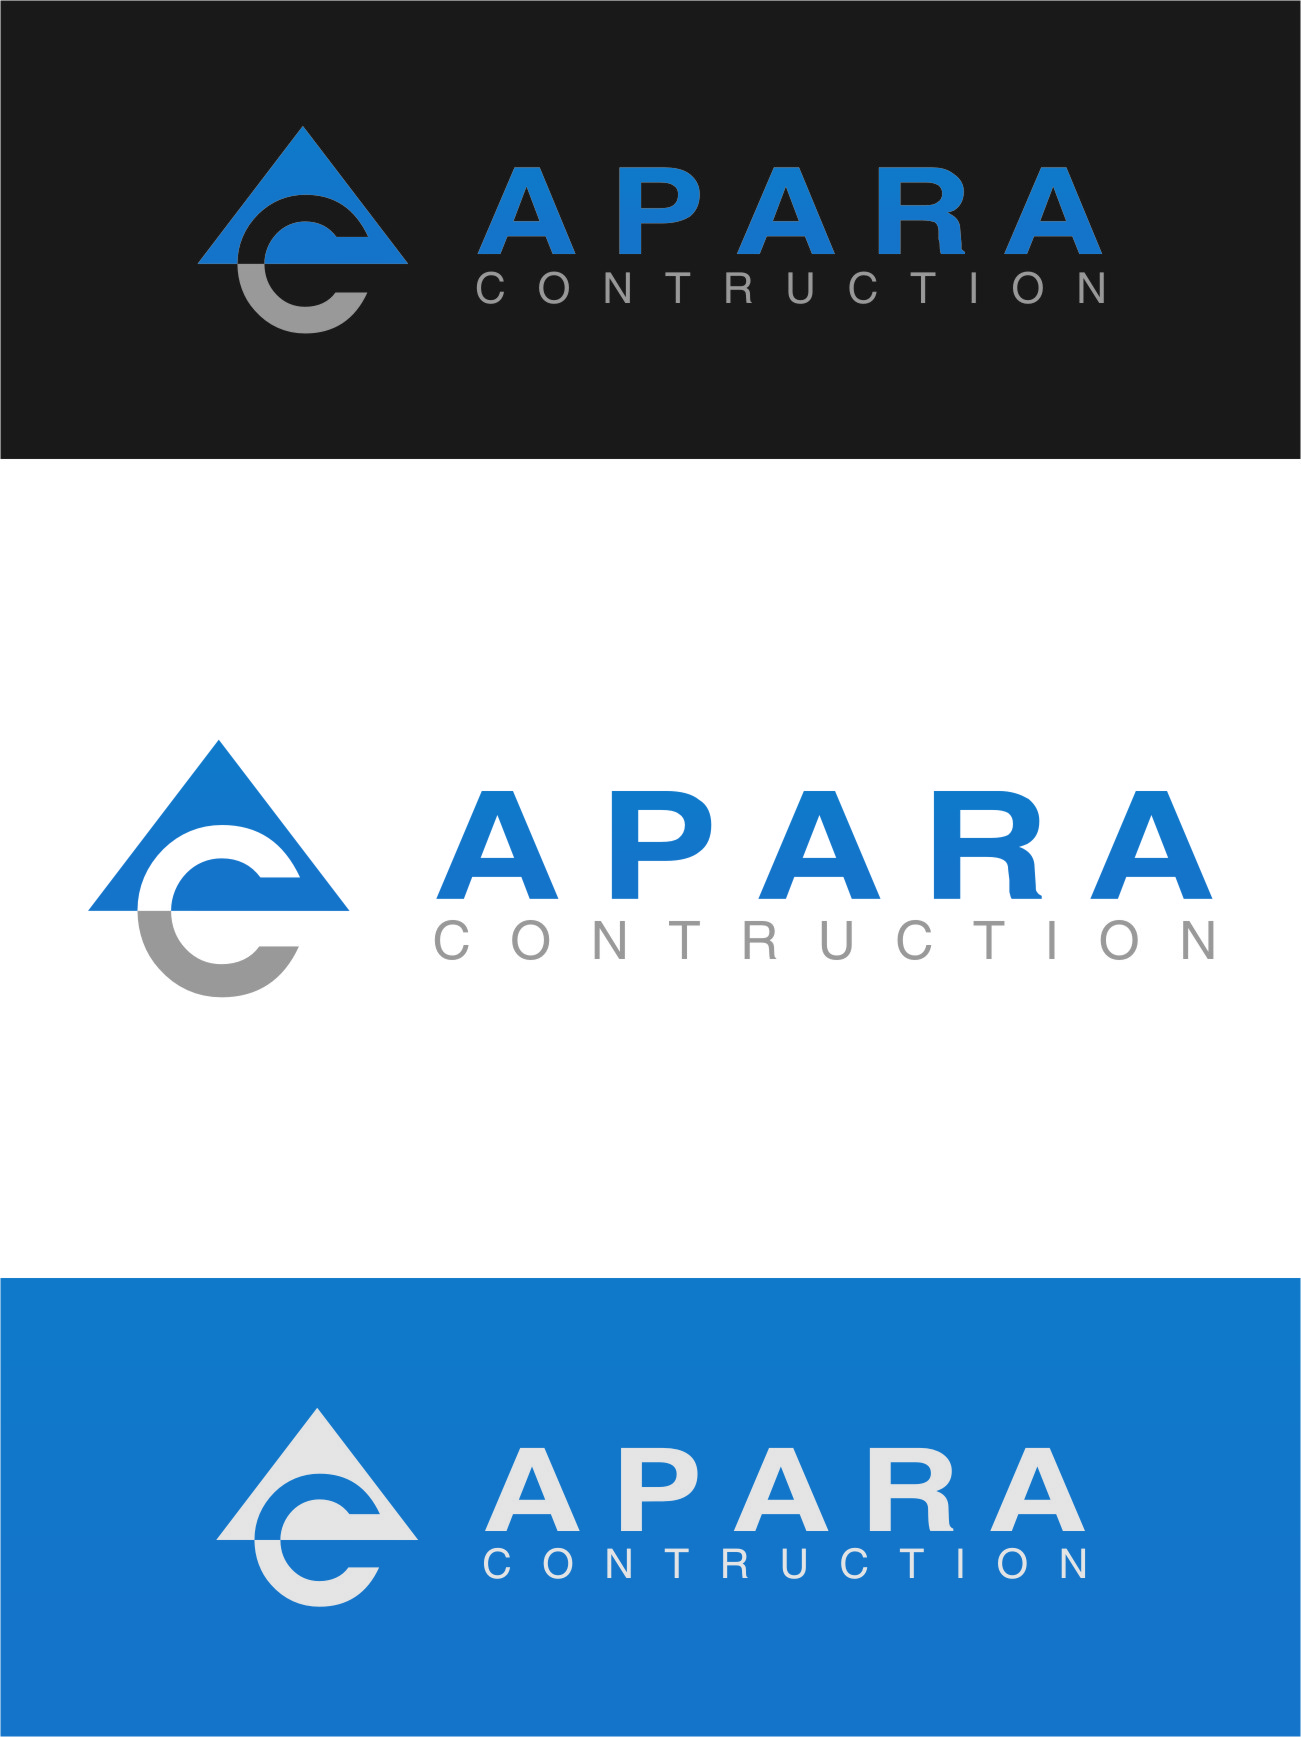 Logo Design by Ngepet_art - Entry No. 30 in the Logo Design Contest Apara Construction Logo Design.